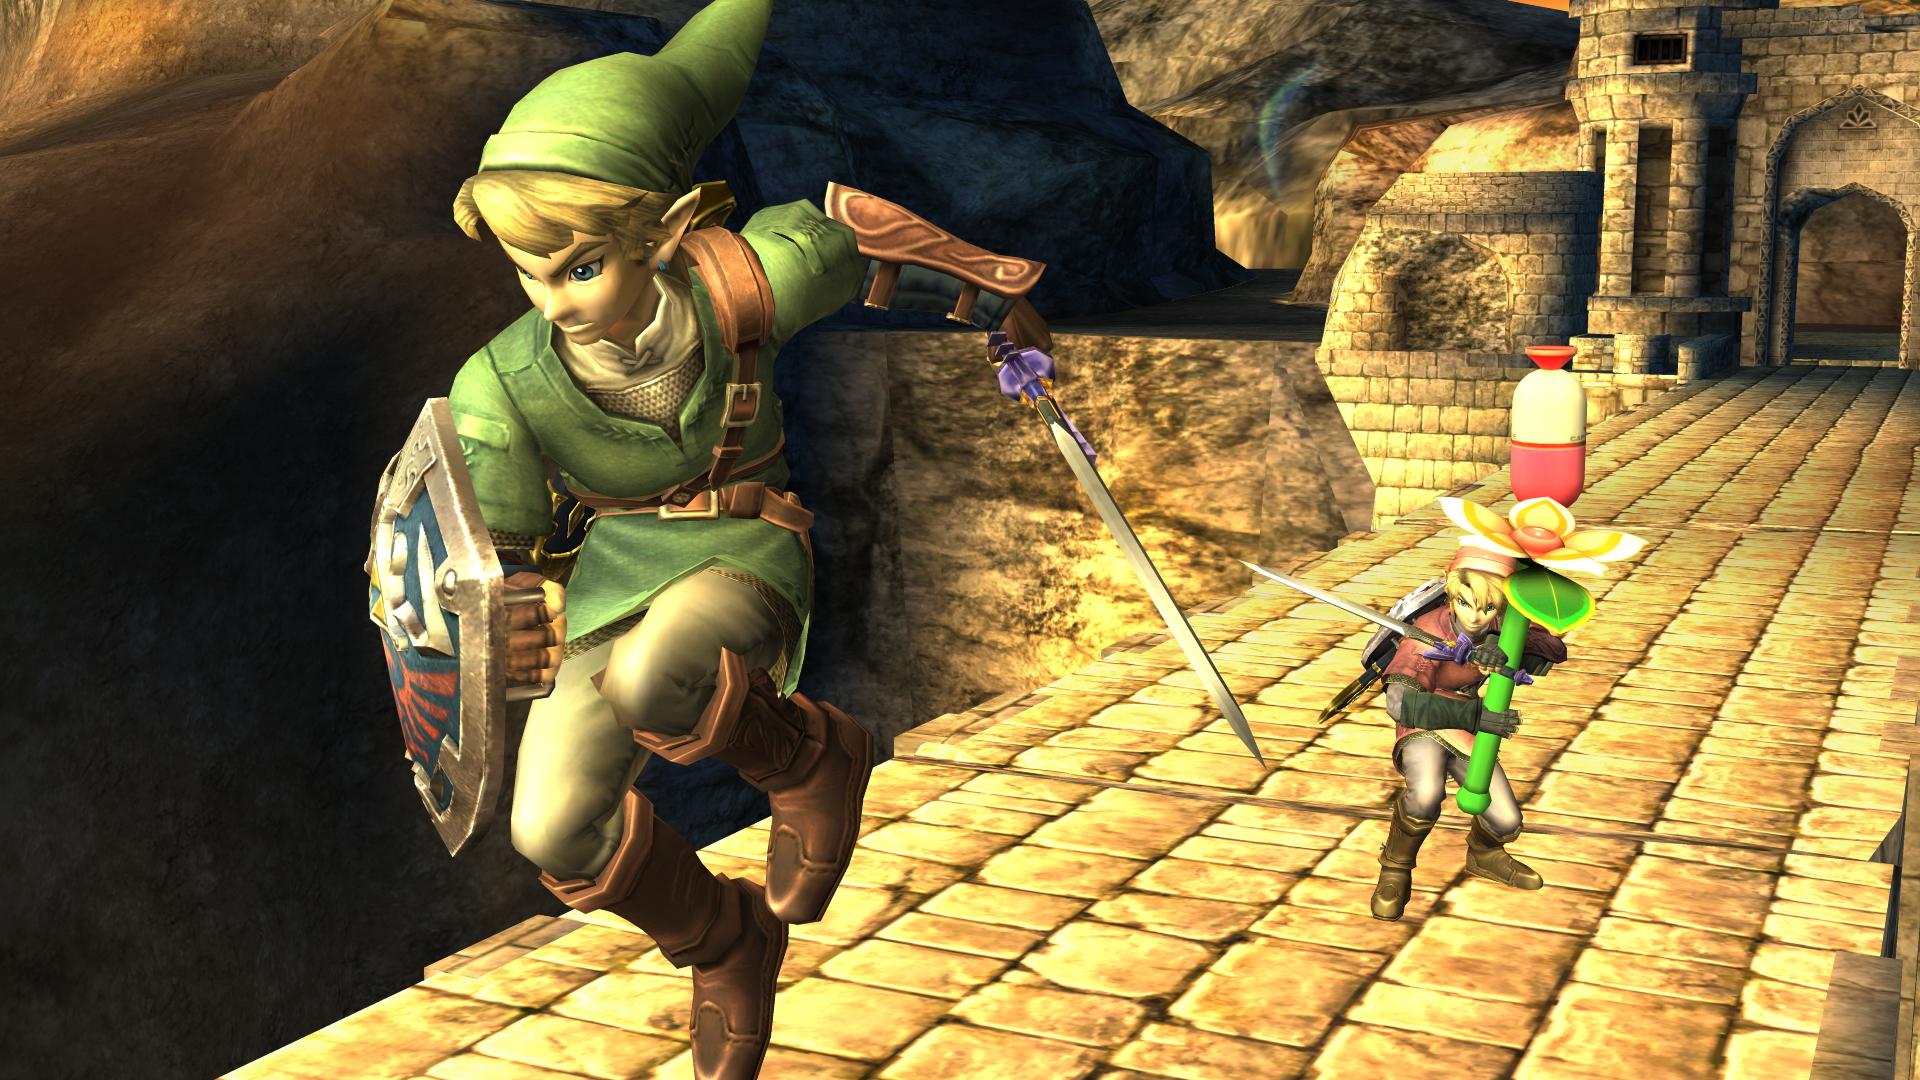 Super Smash Bros Brawl descarga /downaload 1 link MEGA